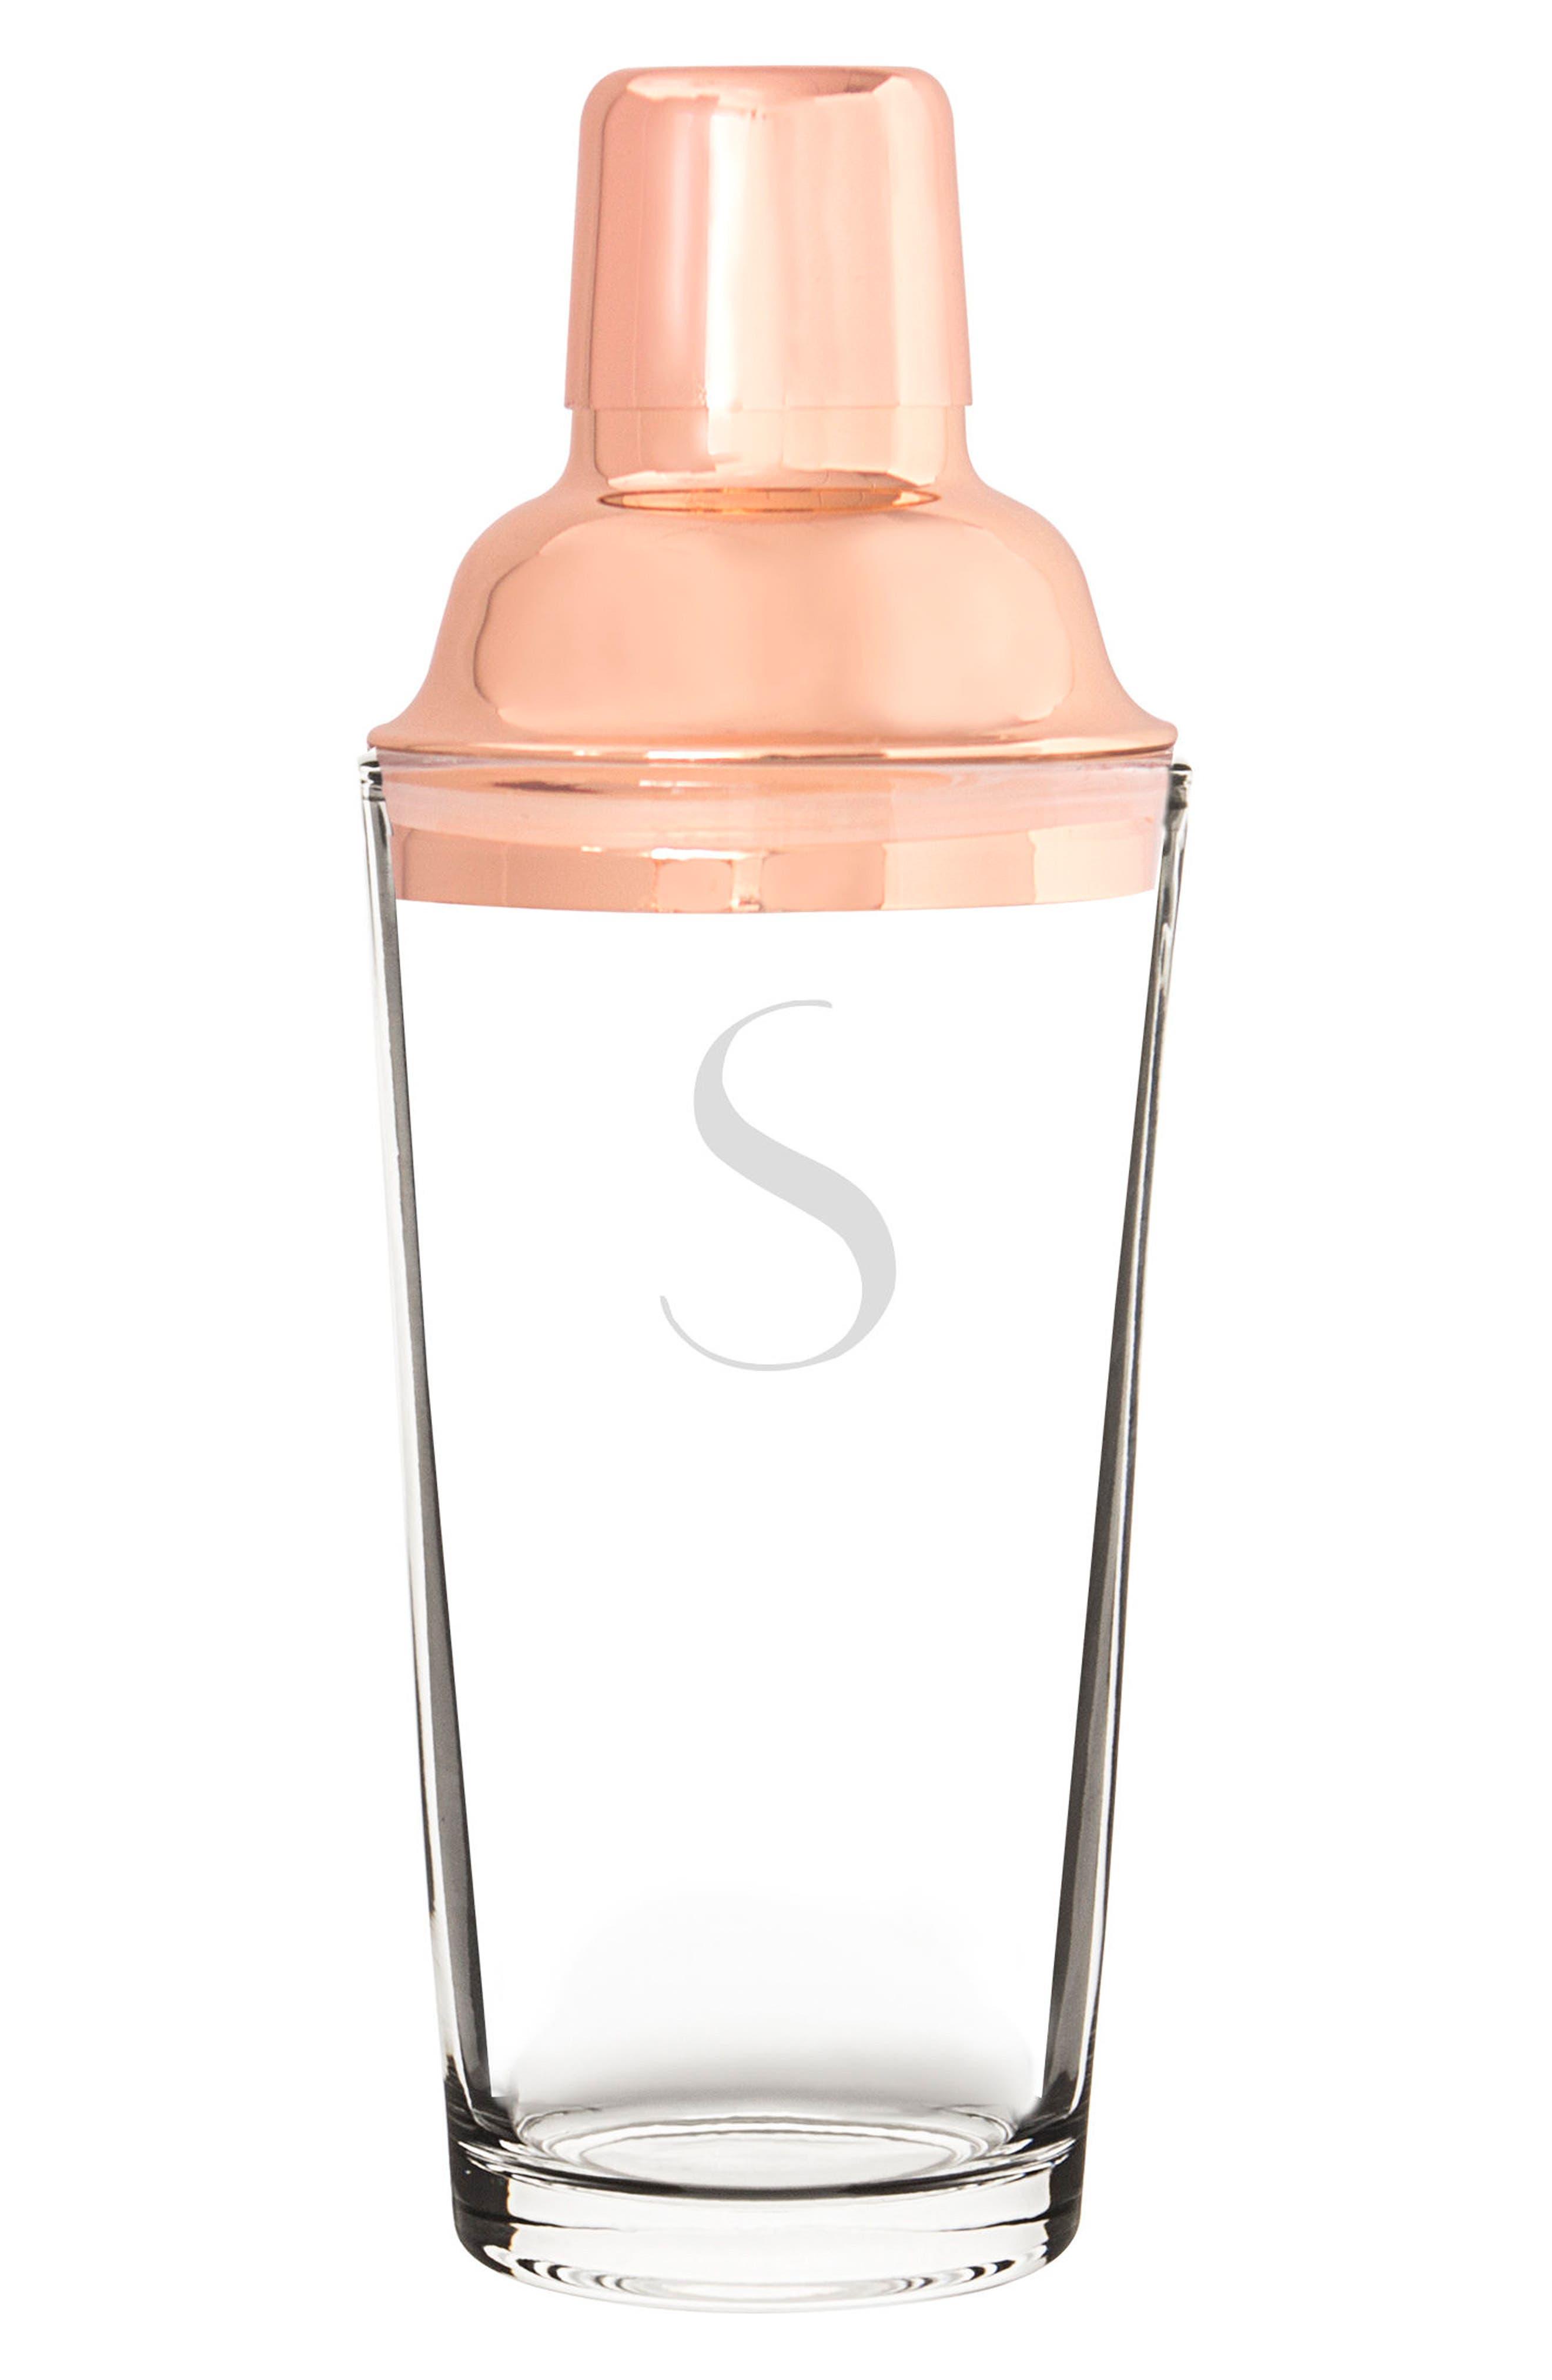 Monogram Coppertone Cocktail Shaker,                             Main thumbnail 20, color,